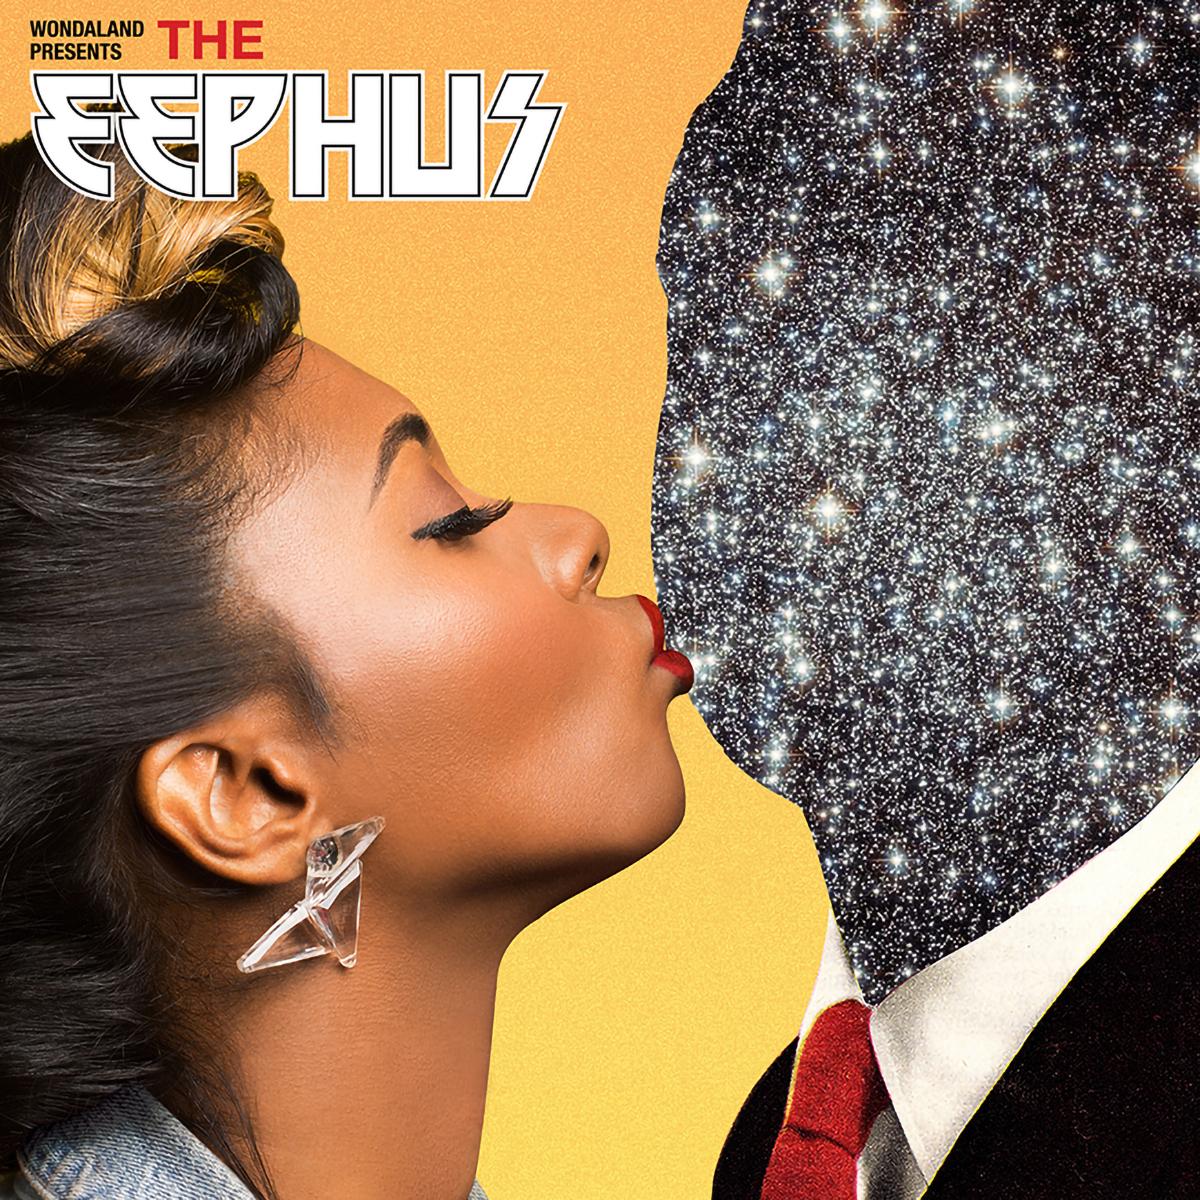 Wondaland Presents The Eephus LP + MP3